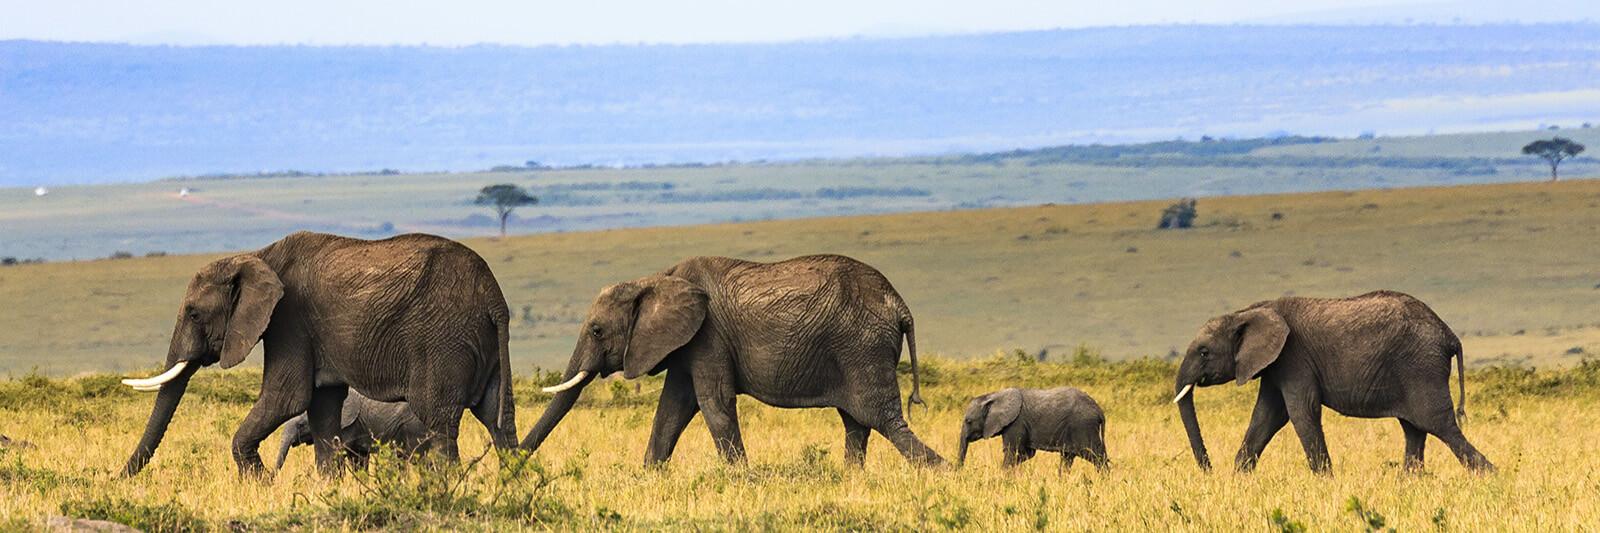 Elephants at Masai Mara 2, Nairobi City, Kenya